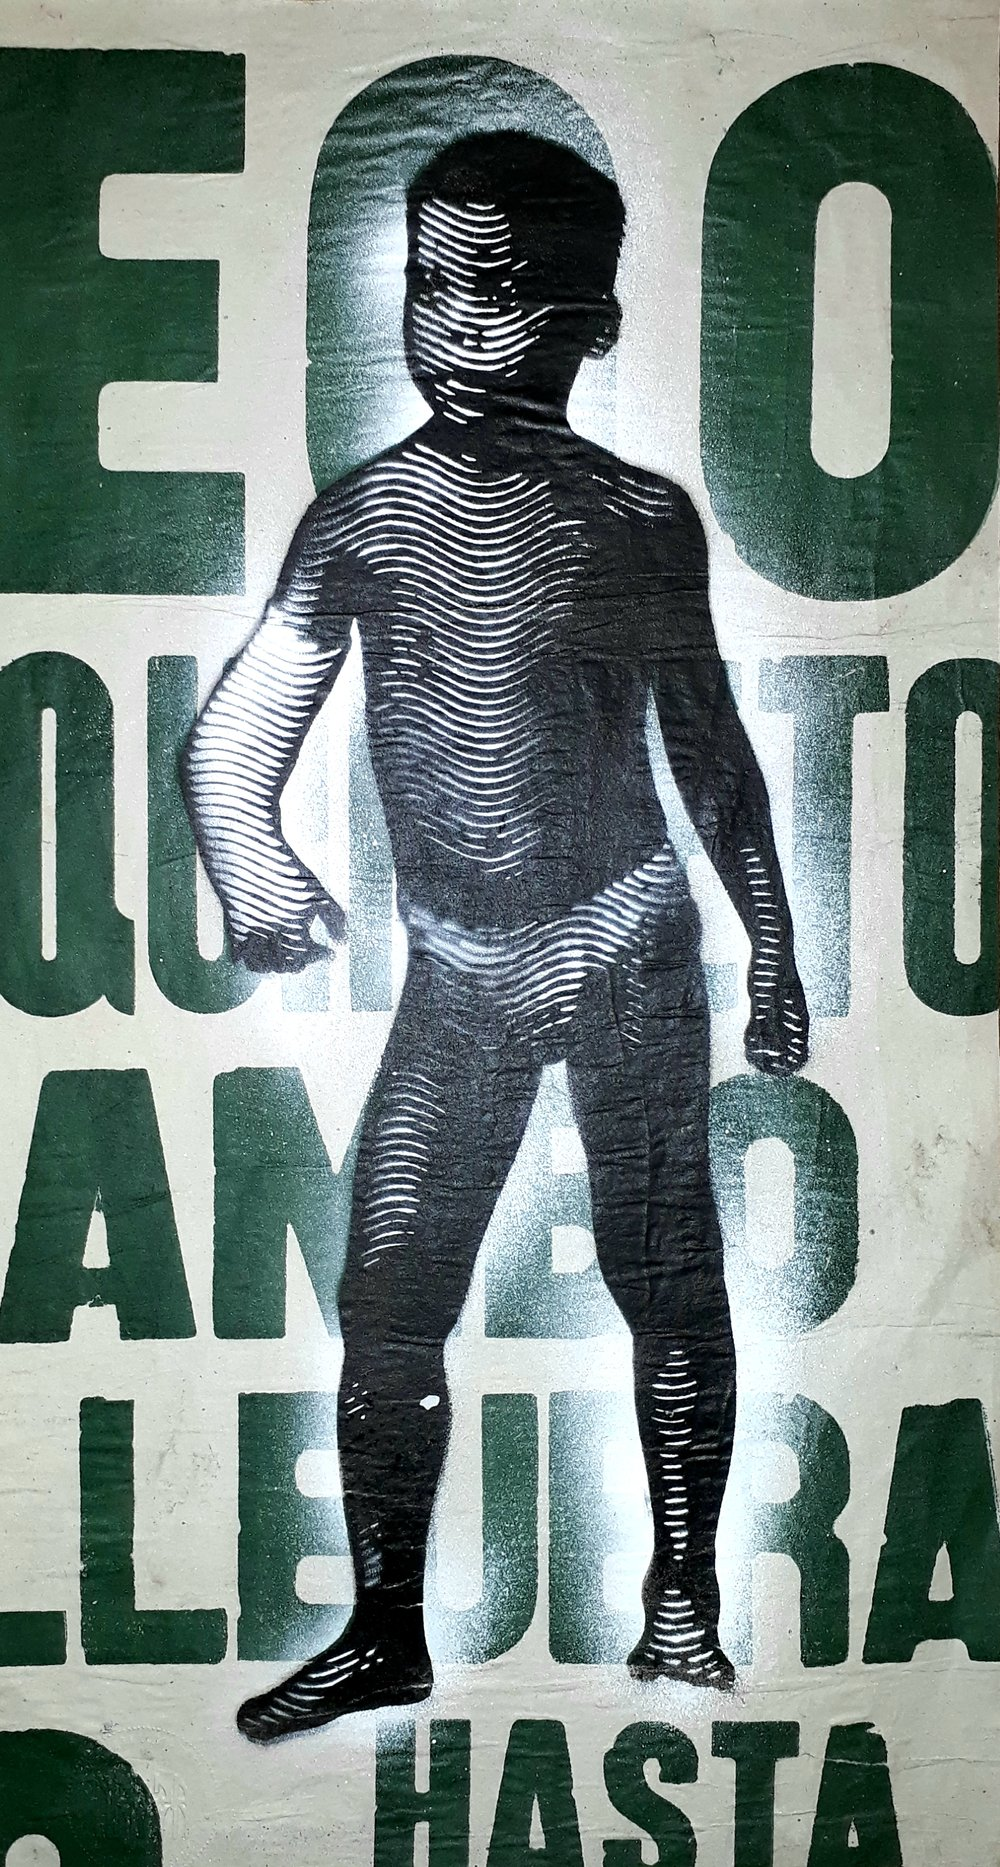 S.T (2018) - 29.5 x 21 cm - Stencil y pintura en aerosol sobre Cartel / Stencil and spray paint on found poster